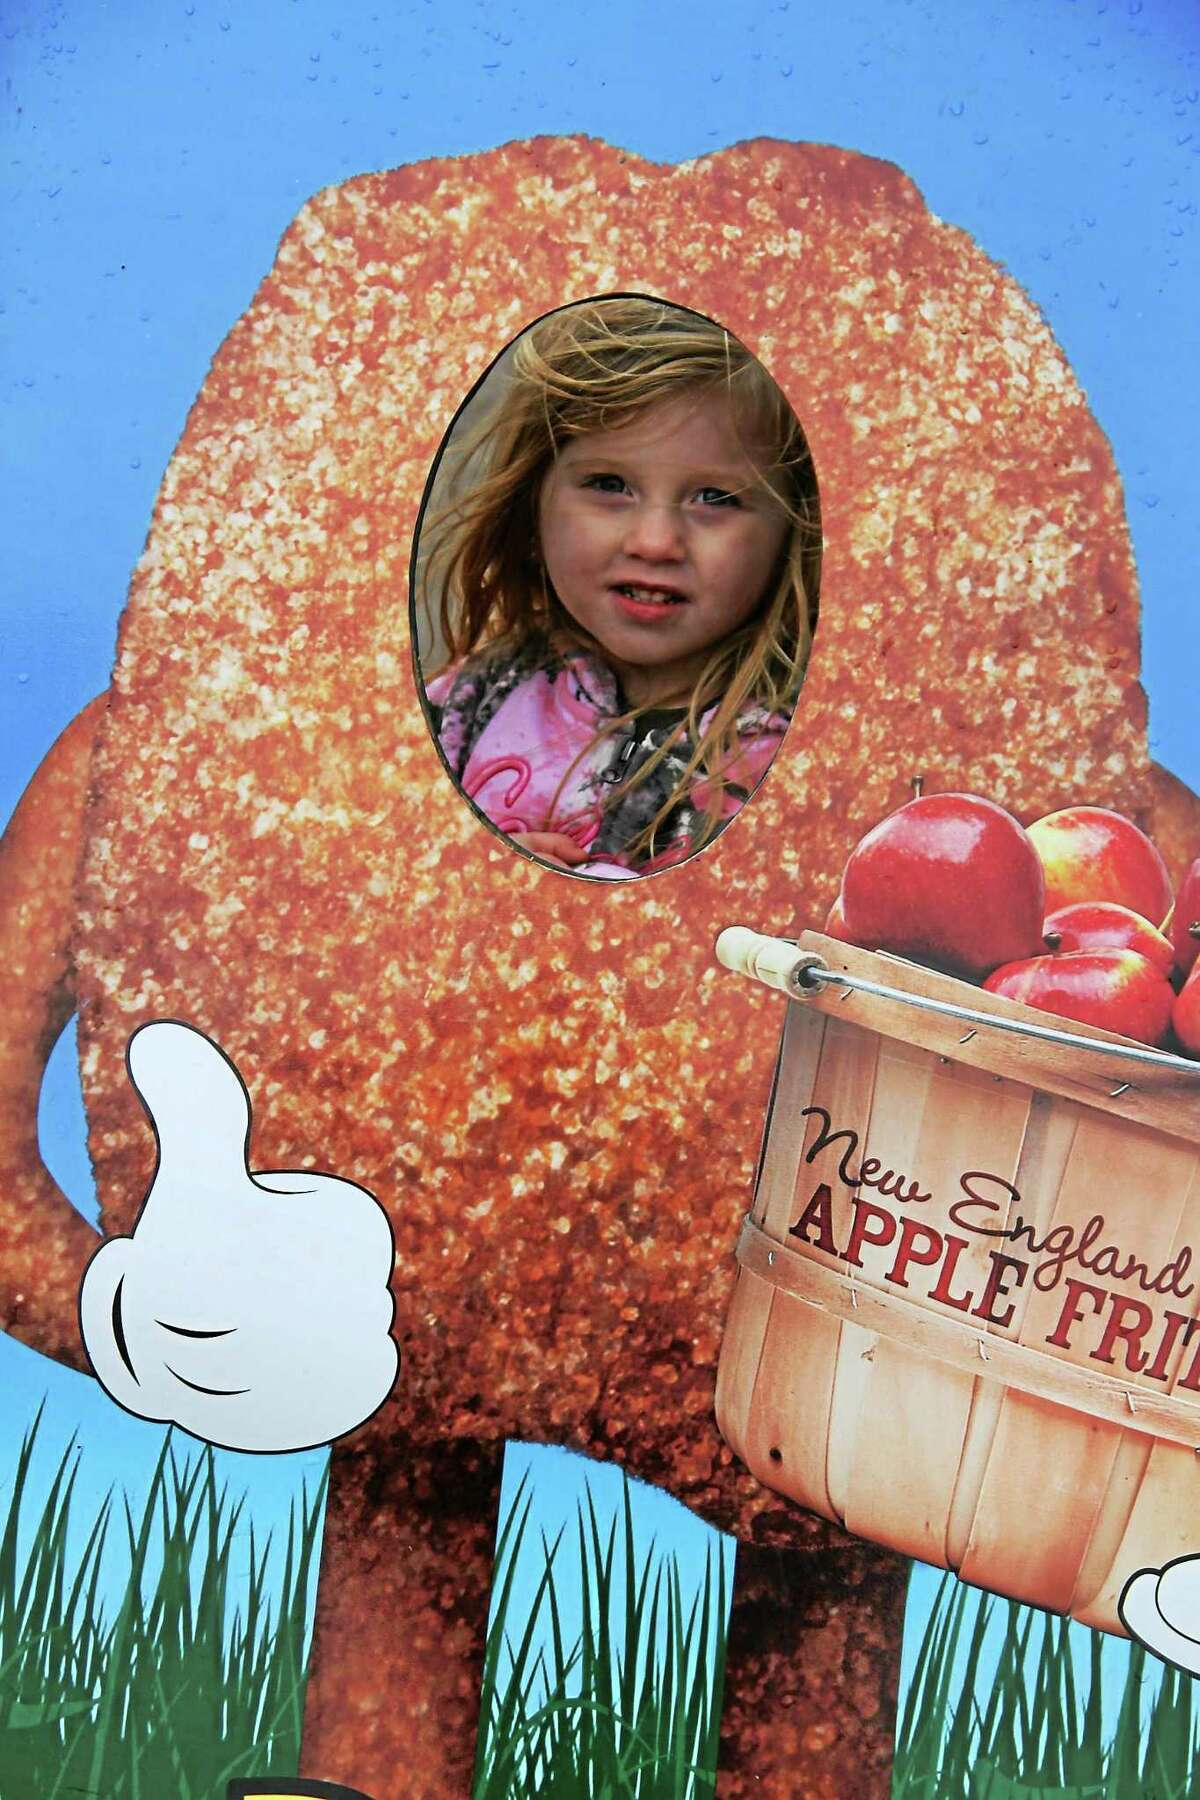 An unidentified child enjoys the fun at the 159th annual Harwinton Fair.